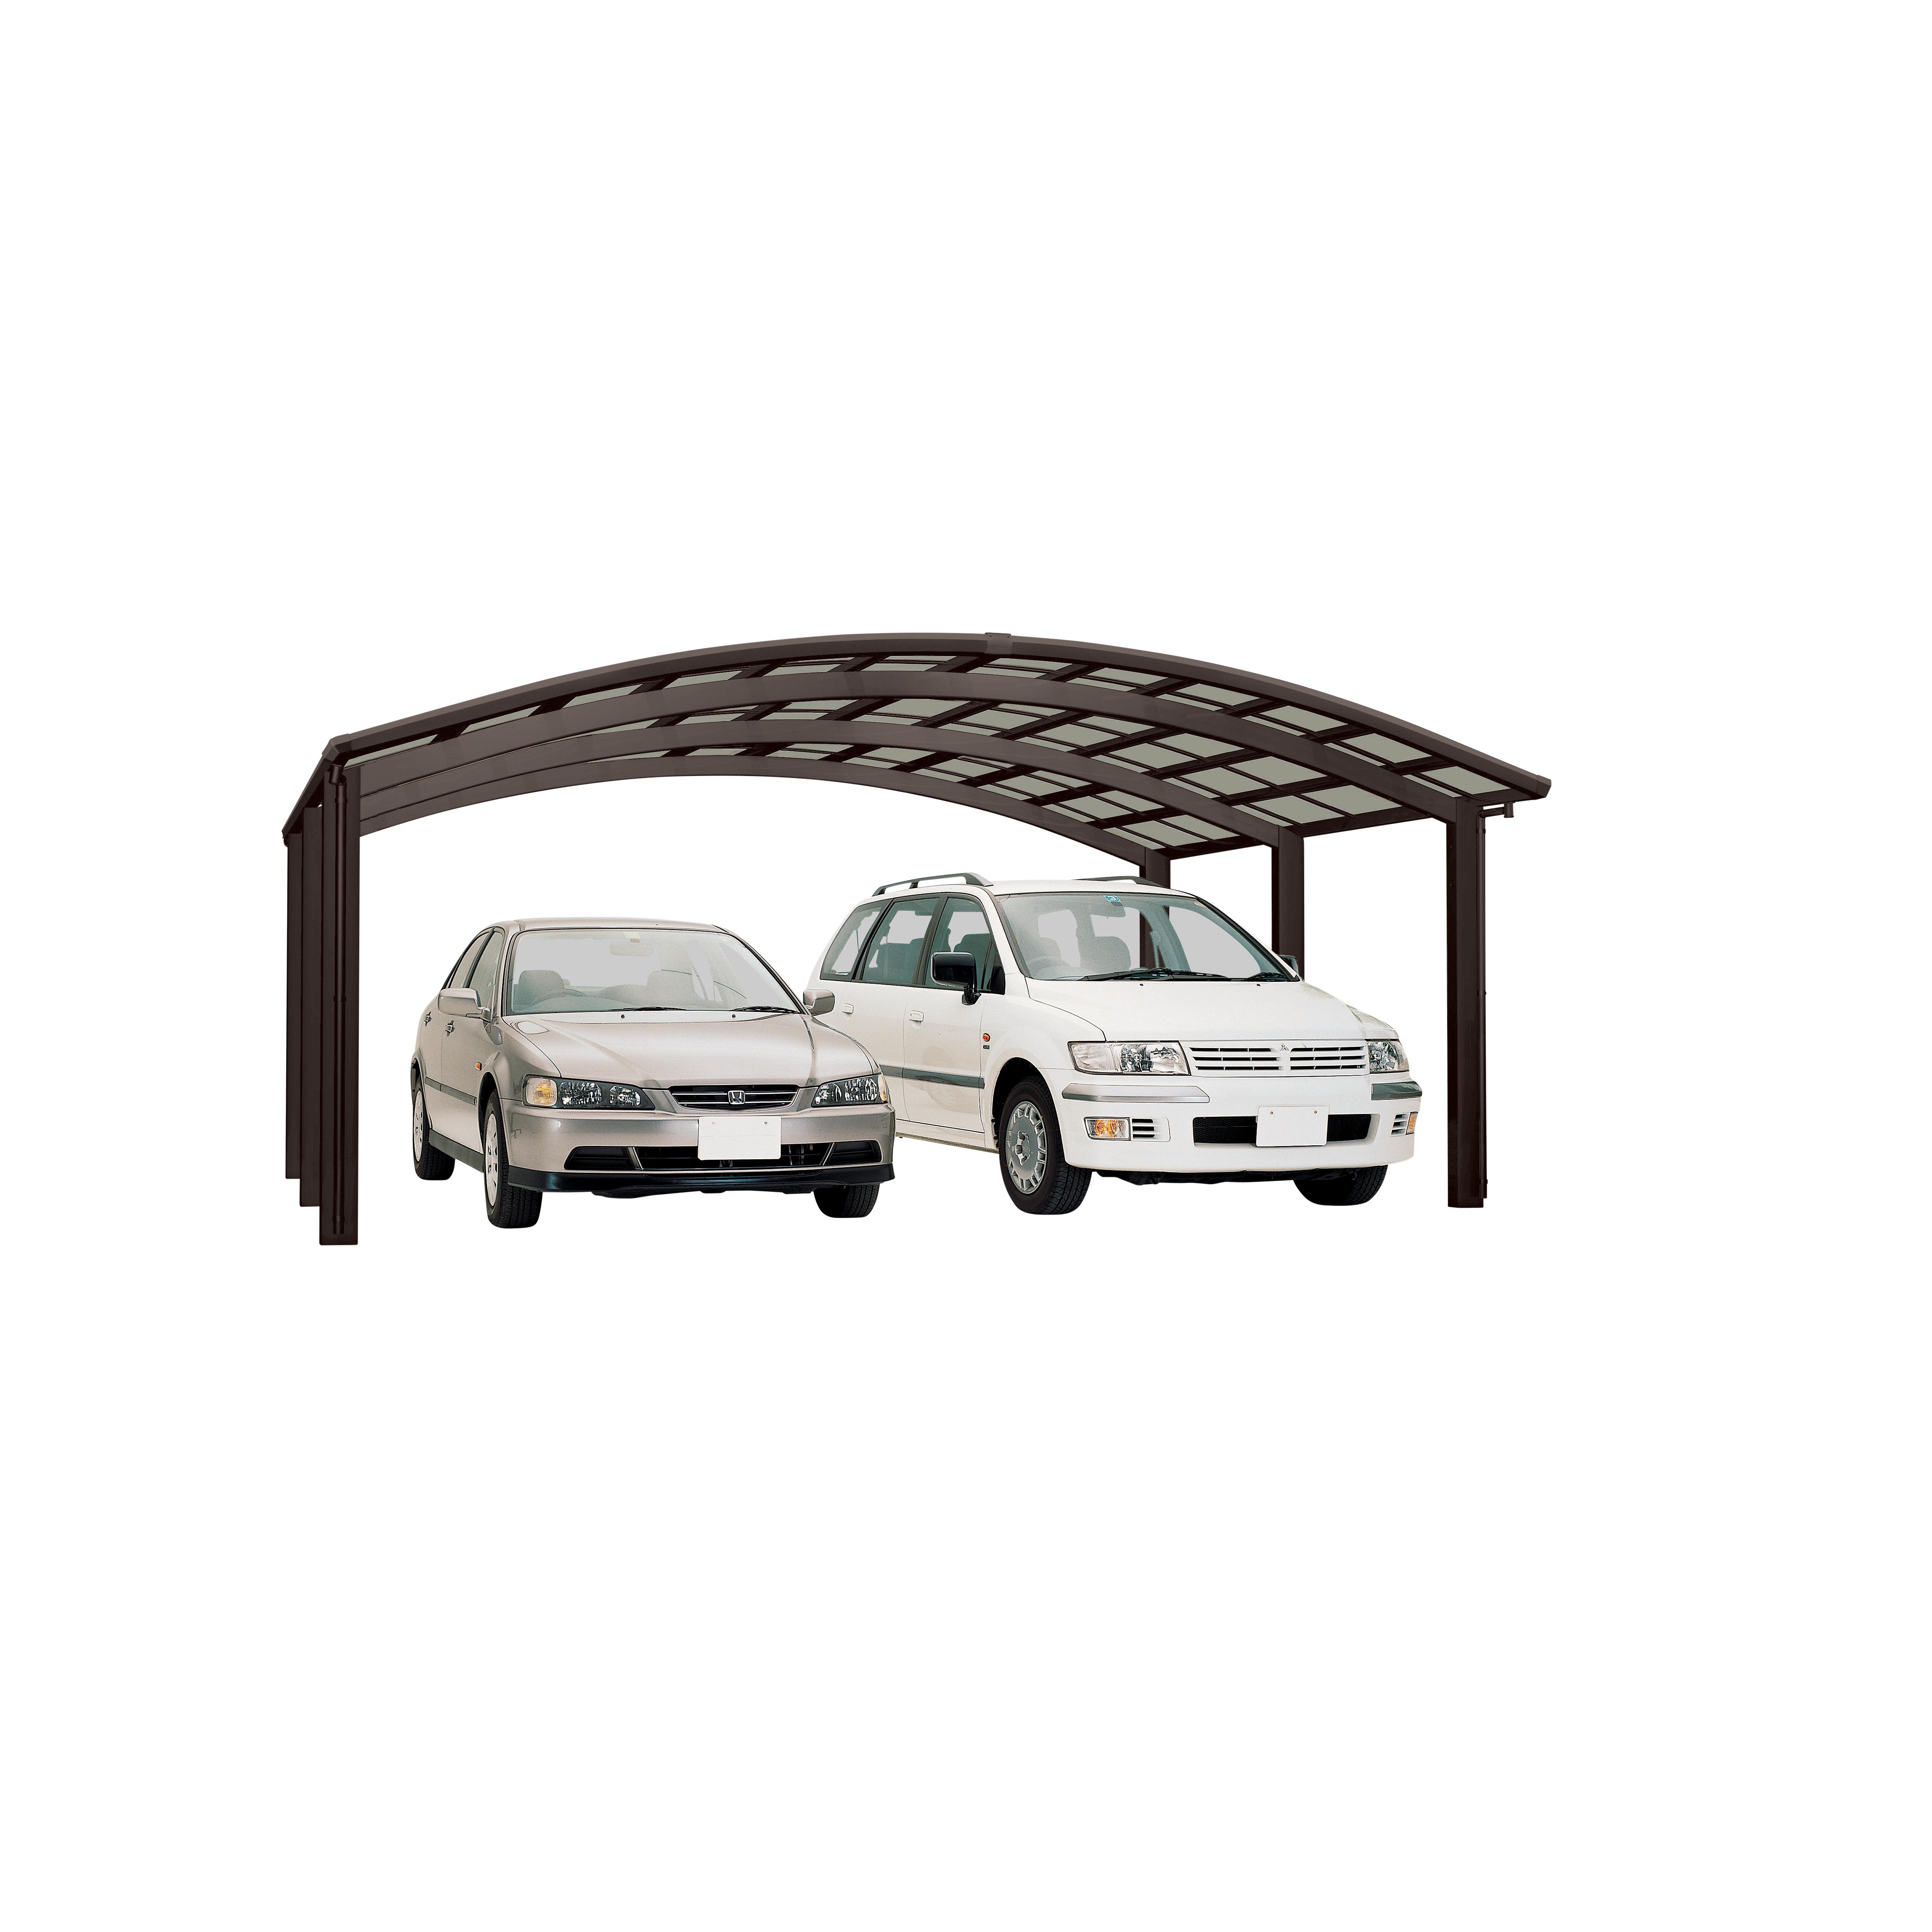 carport ximax portoforte aluminium typ 110 m braun 495x542x248cm bei. Black Bedroom Furniture Sets. Home Design Ideas